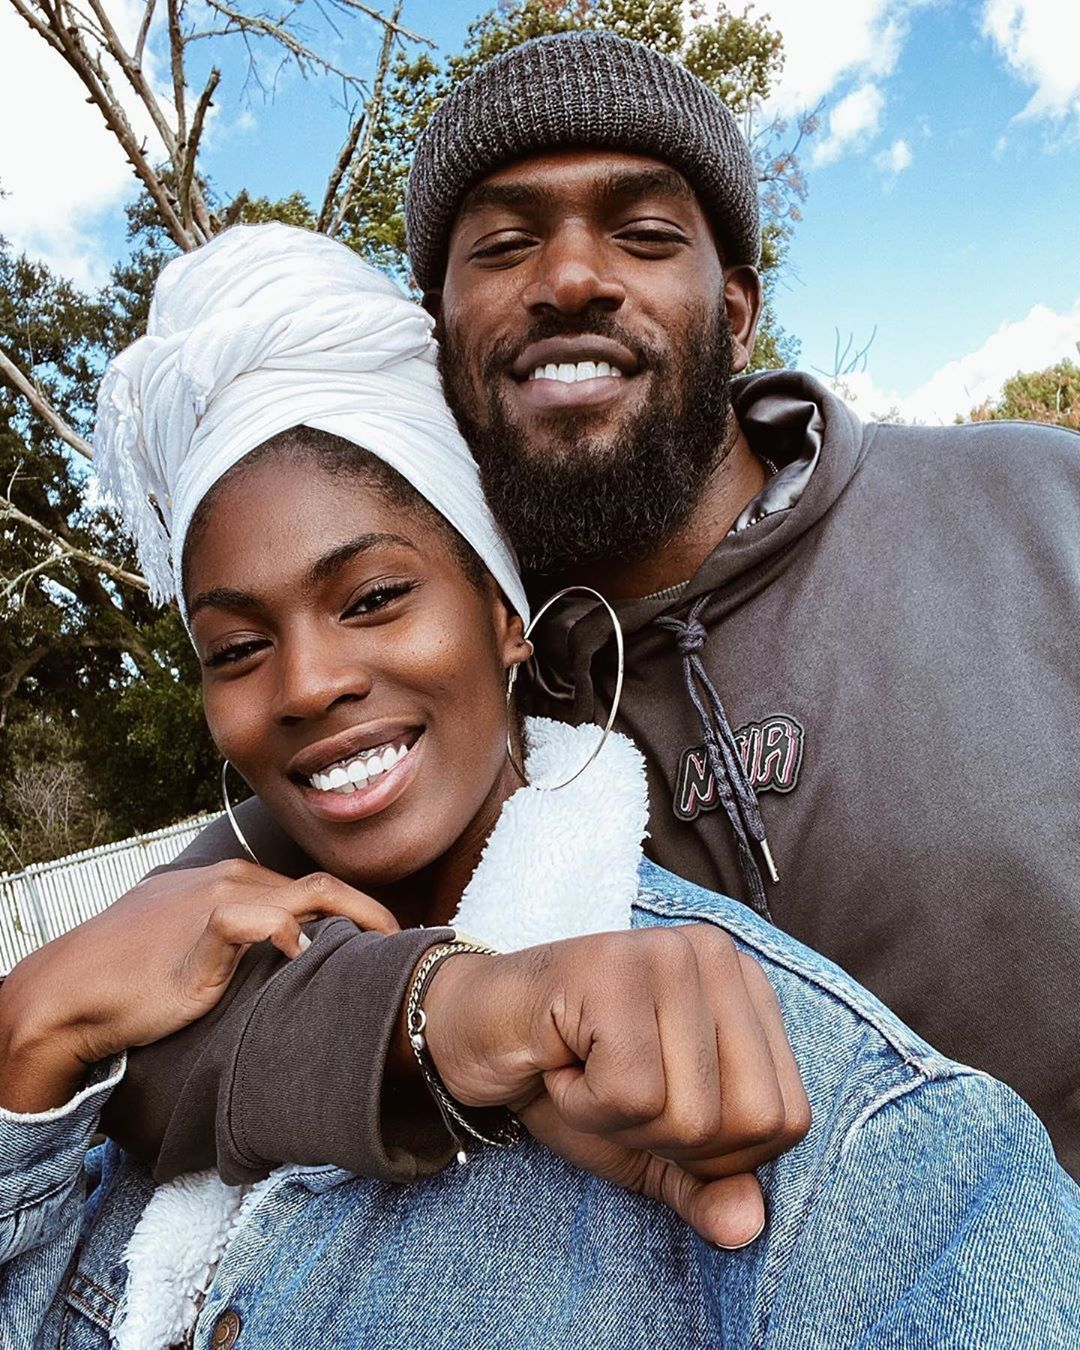 Image result for black couples dark skin